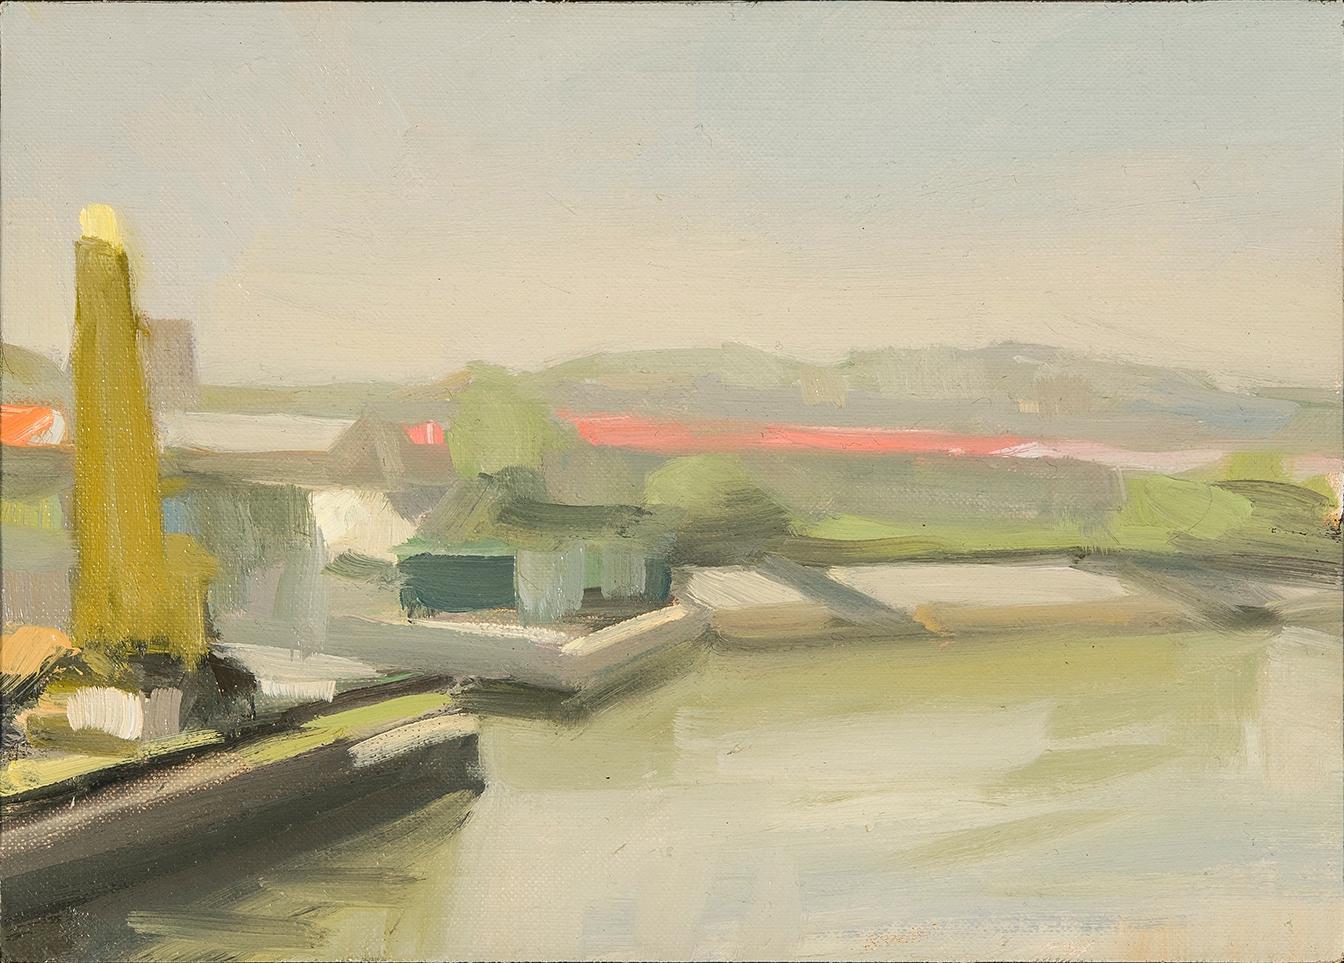 Yellow Crane, Pink Roof